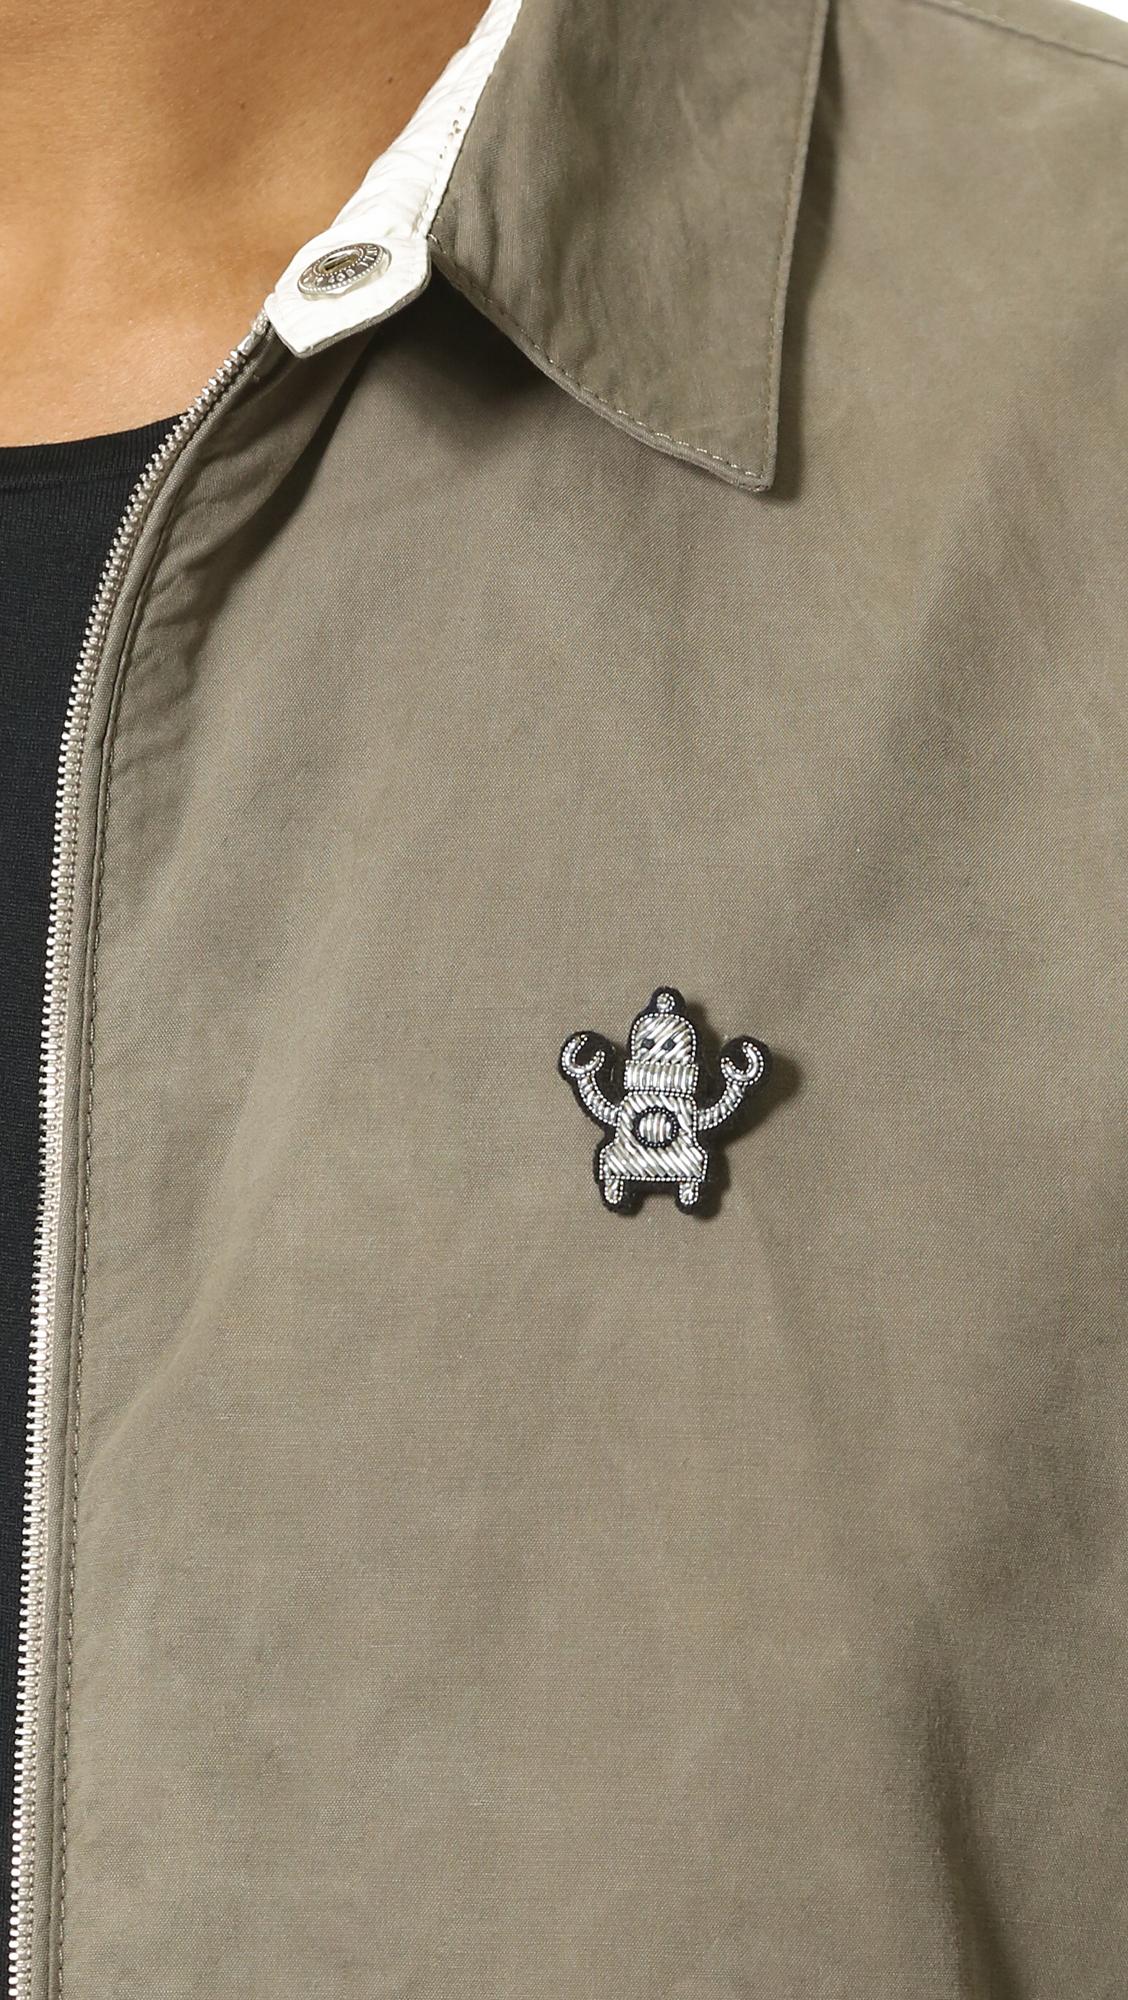 Macon & Lesquoy Robot Pin - Silver WnPkvHGKN